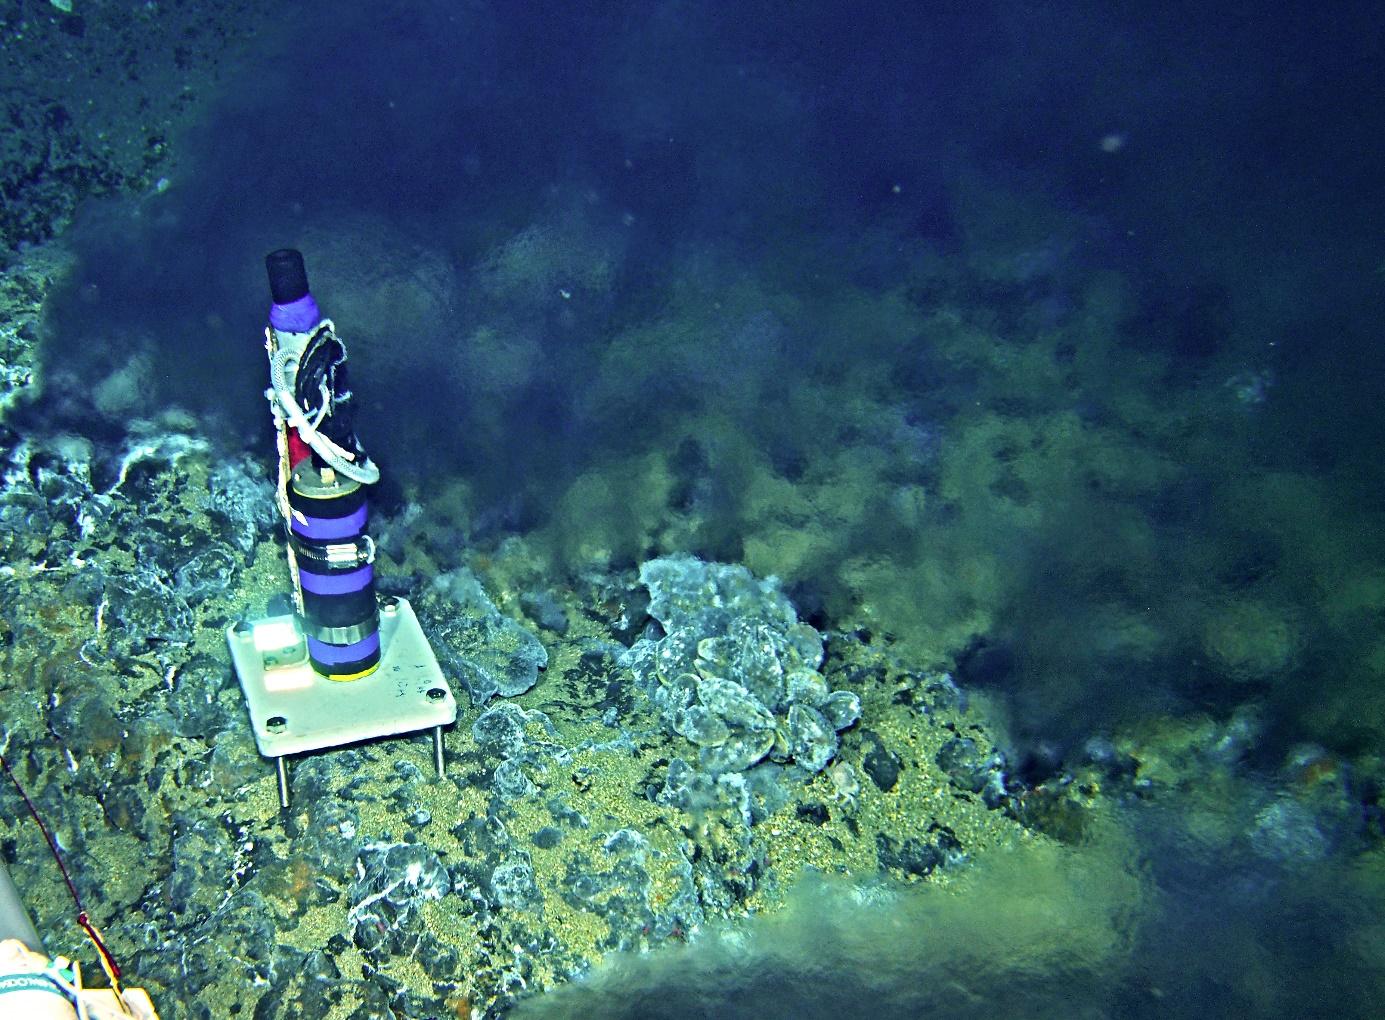 水曜海山熱水域に設置した集音装置